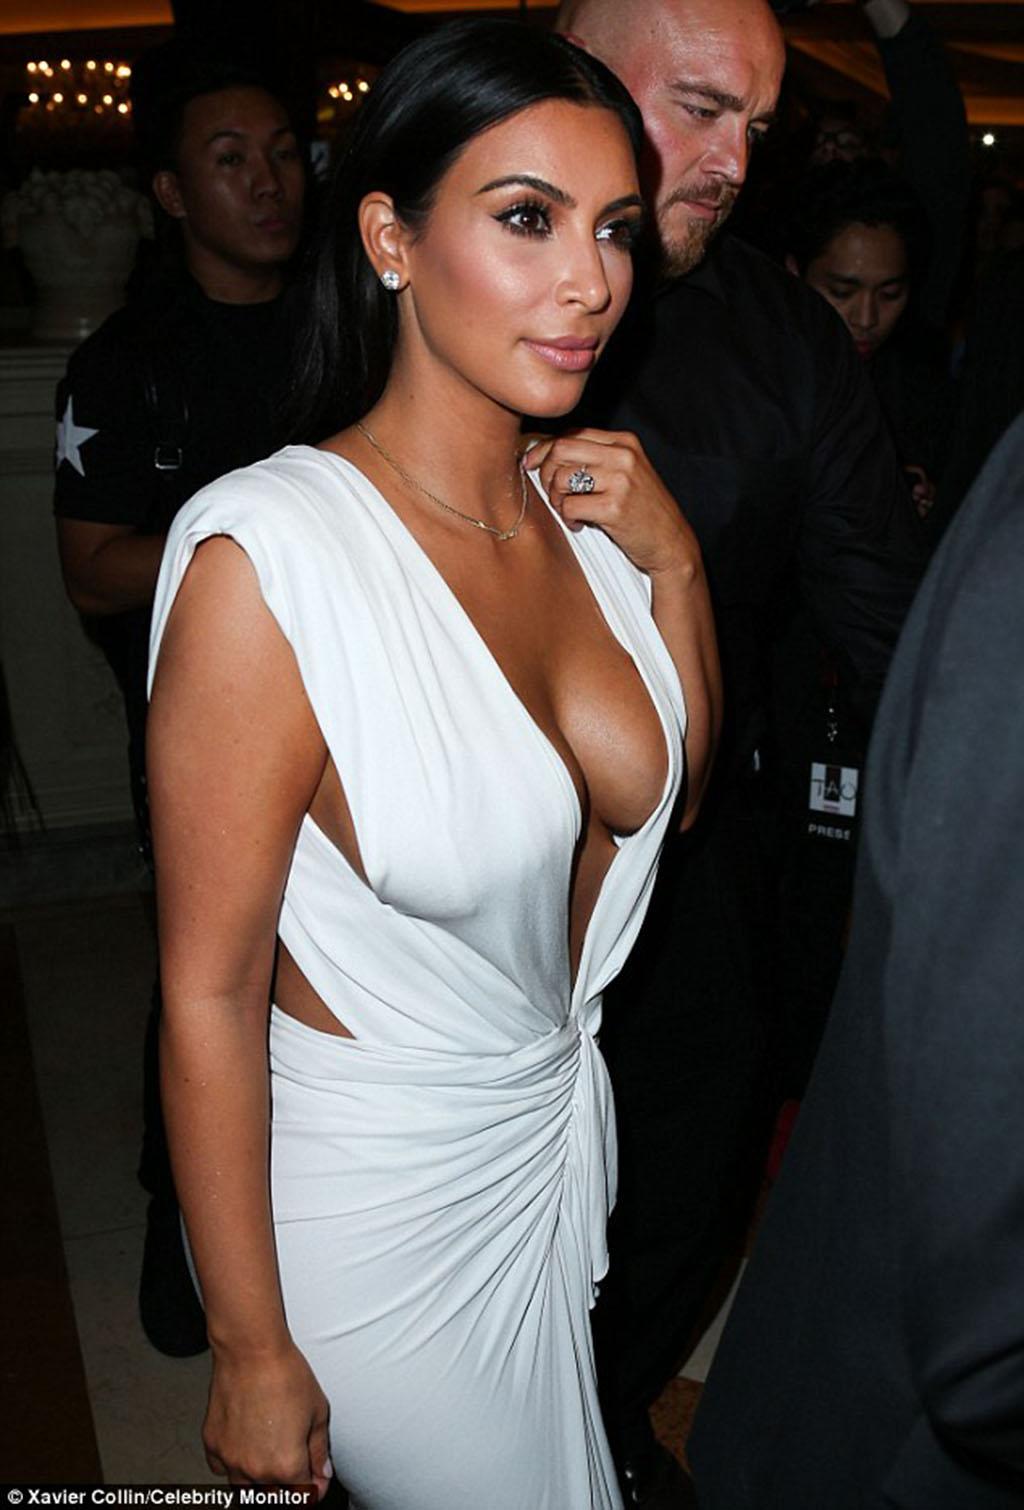 Kim-Kardashian-in-white-dress-on-her-birthday-in-Las-Vegas-1024